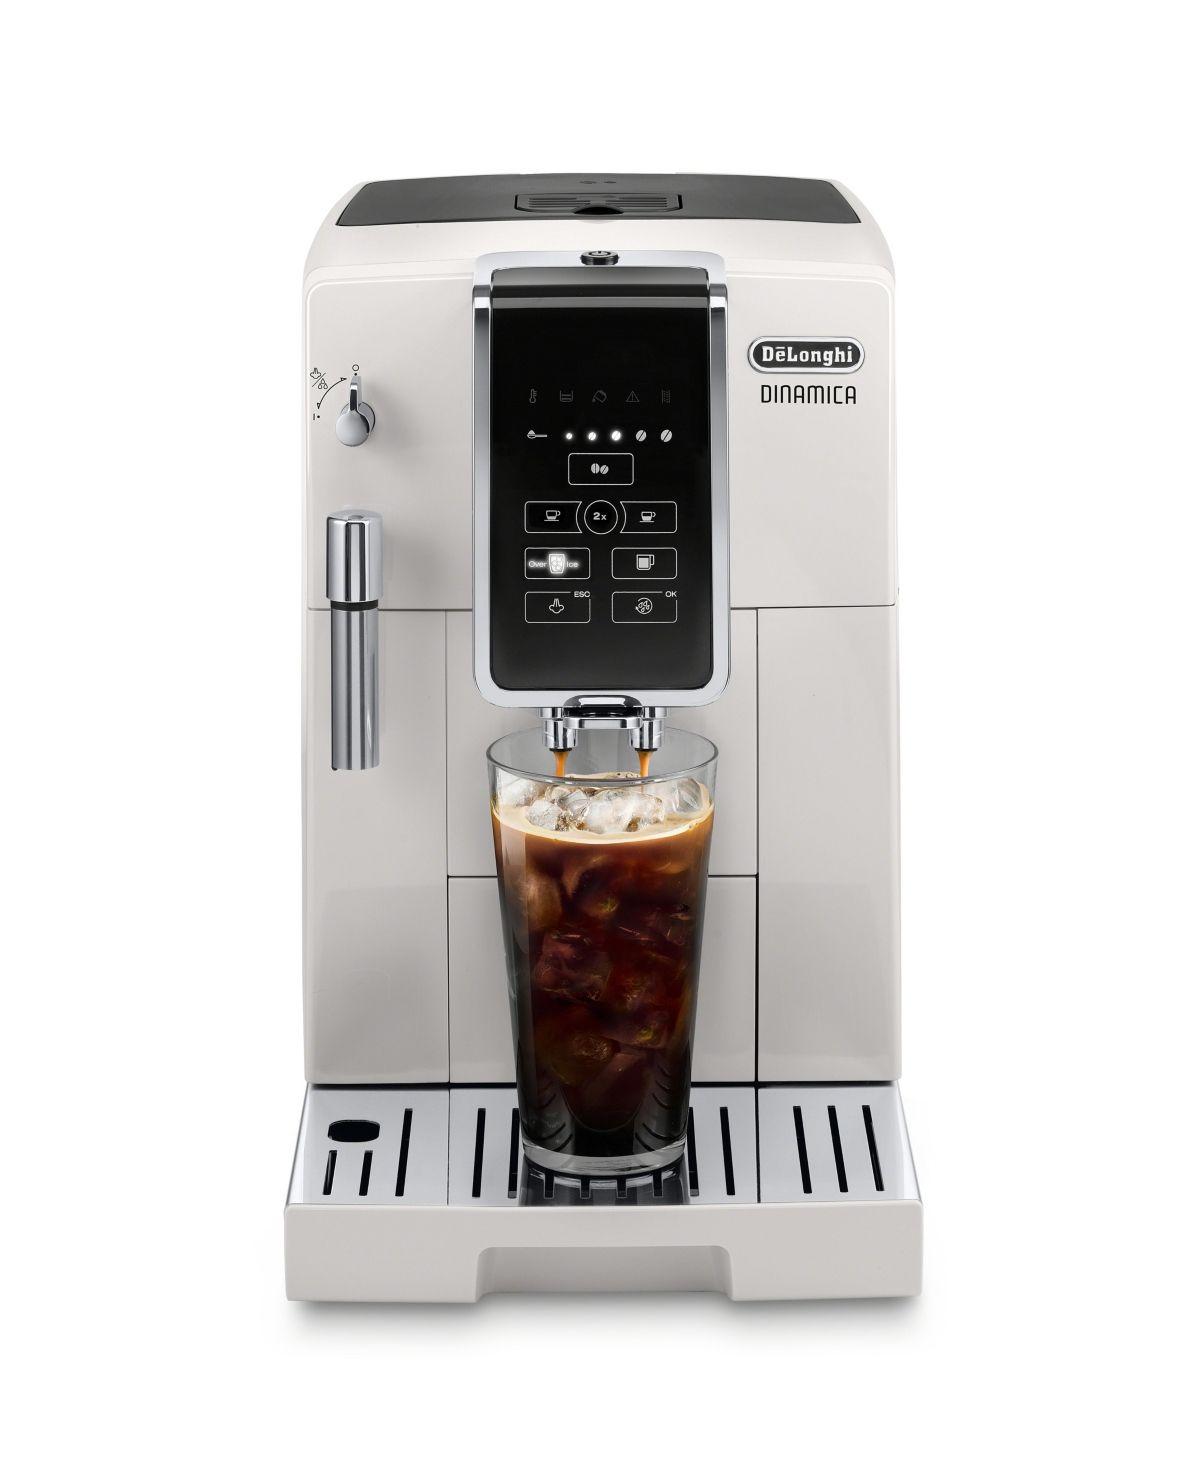 De'Longhi Dinamica Automatic Coffee & Espresso Machine with Iced Coffee, TrueBrew Over Ice Black - White #espressoathome